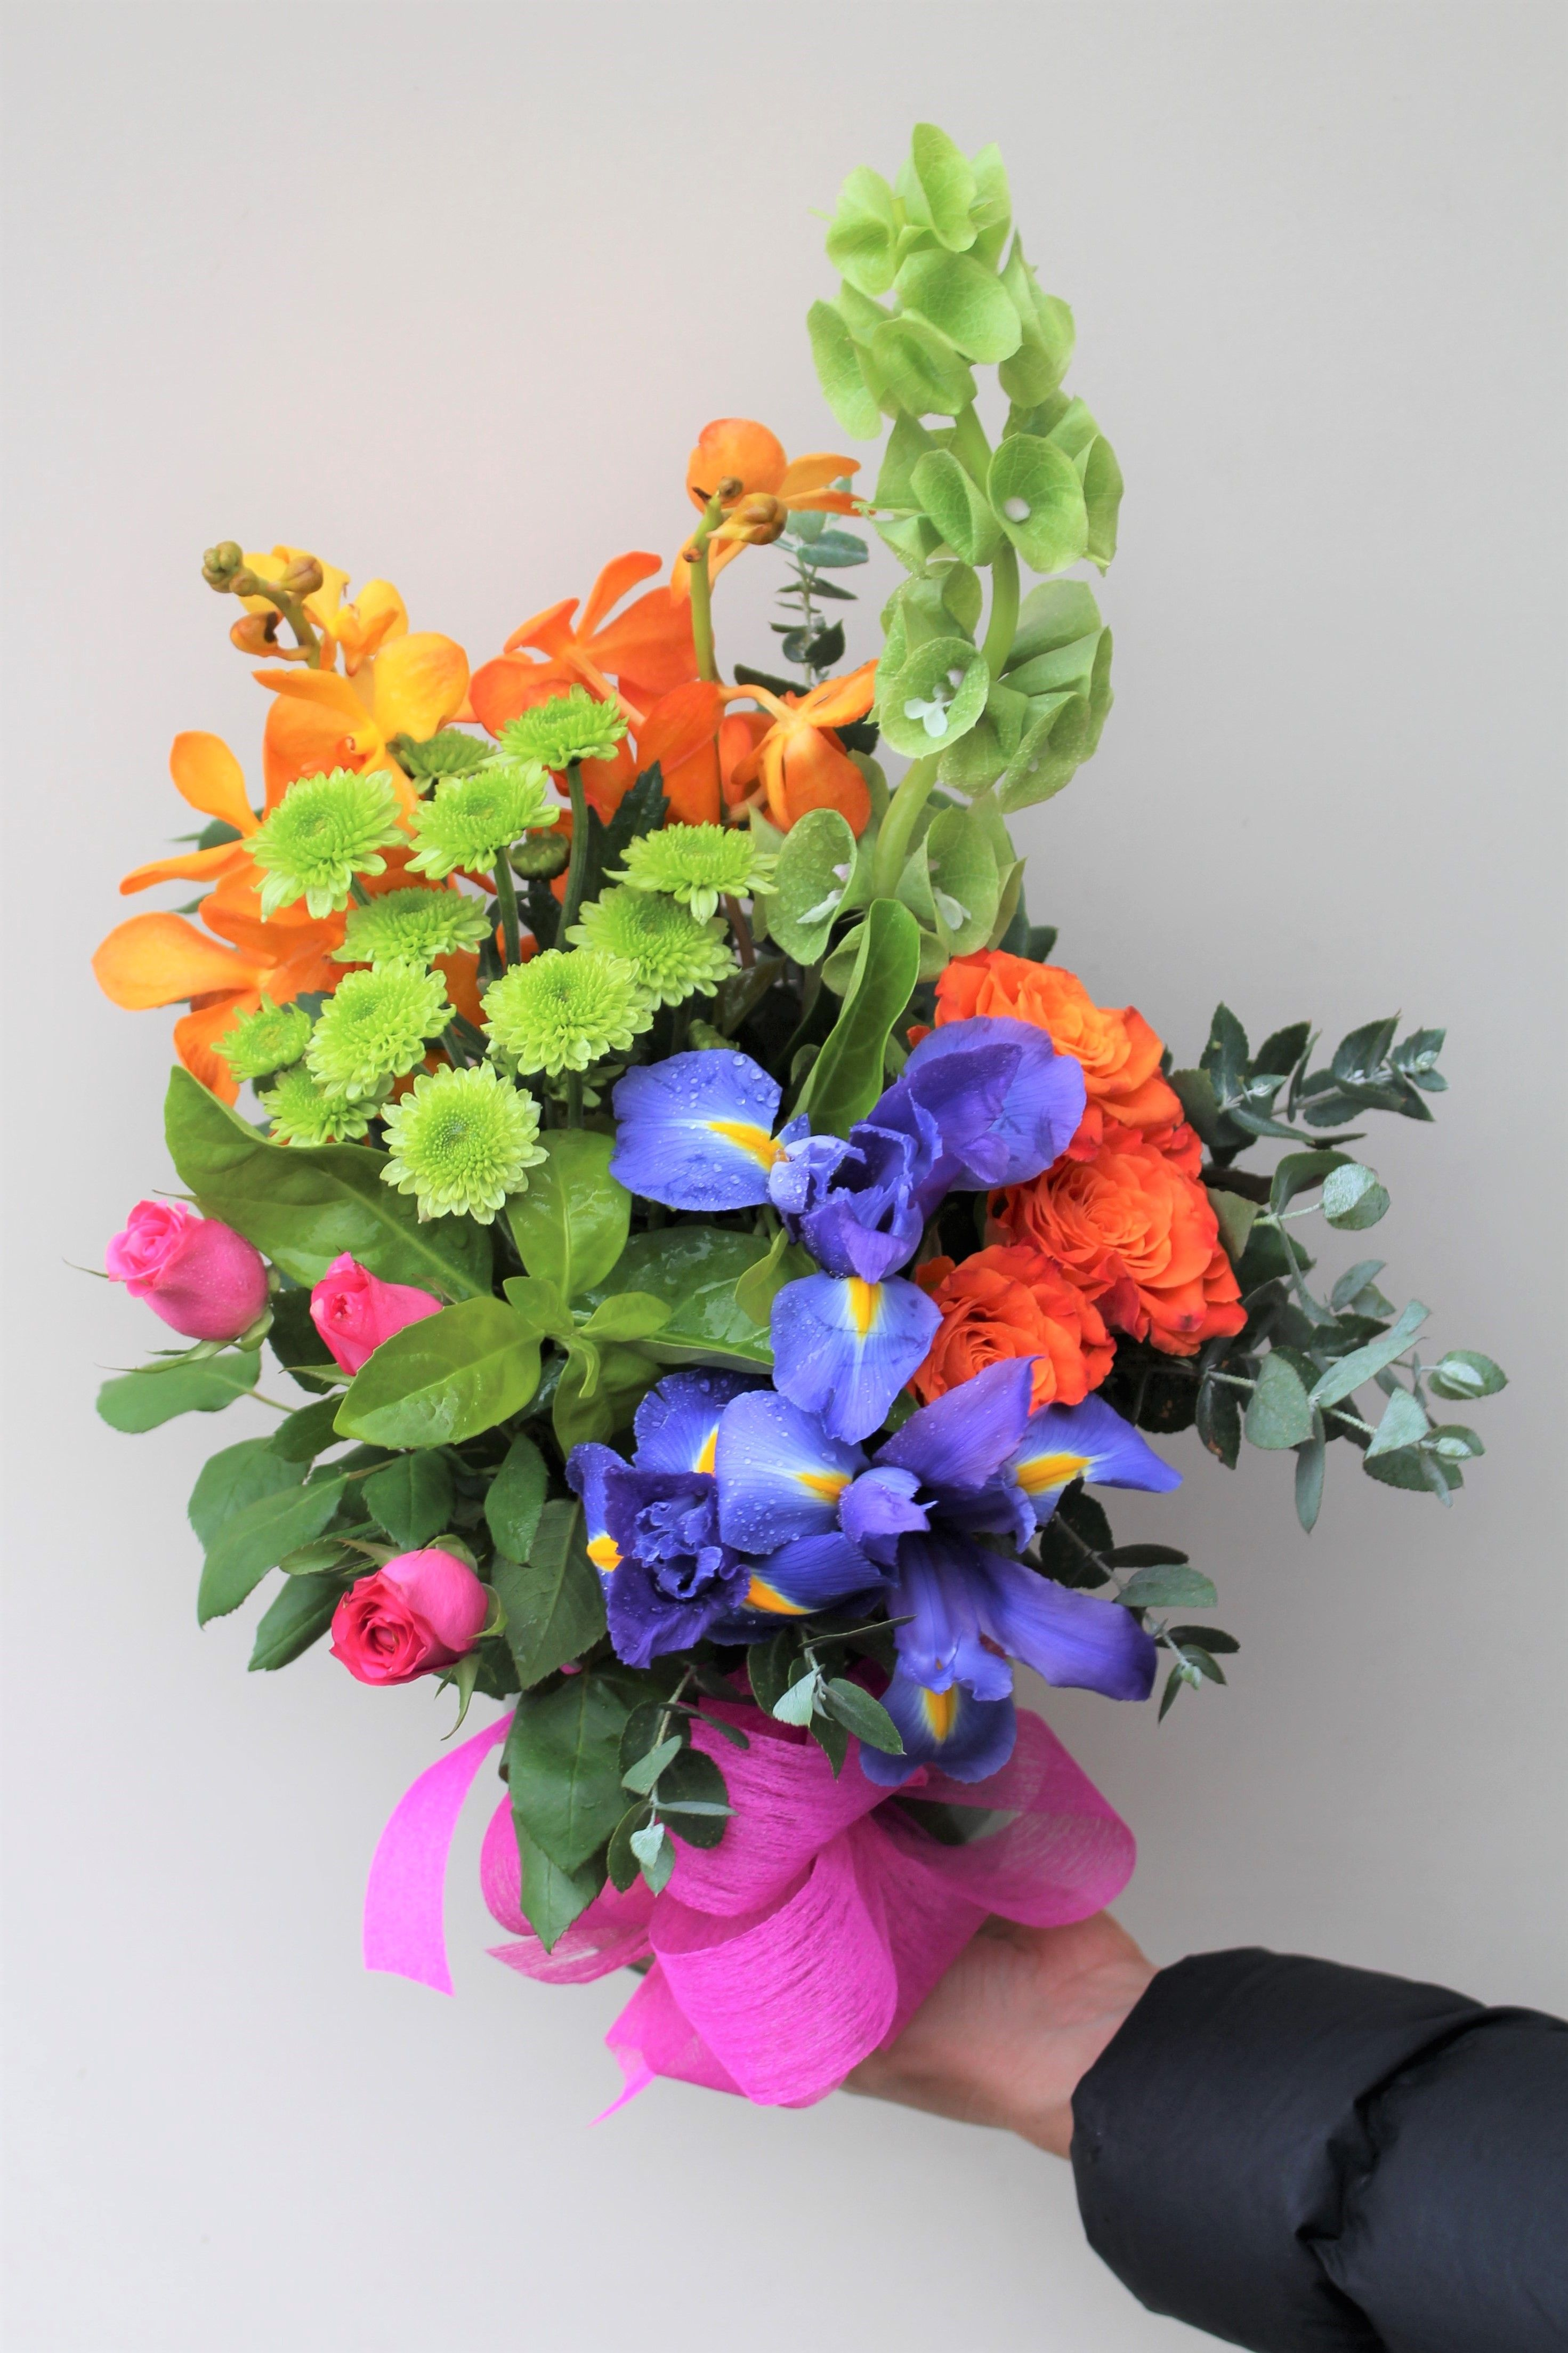 Sparkling Love with Vase in 2020 Online flower delivery